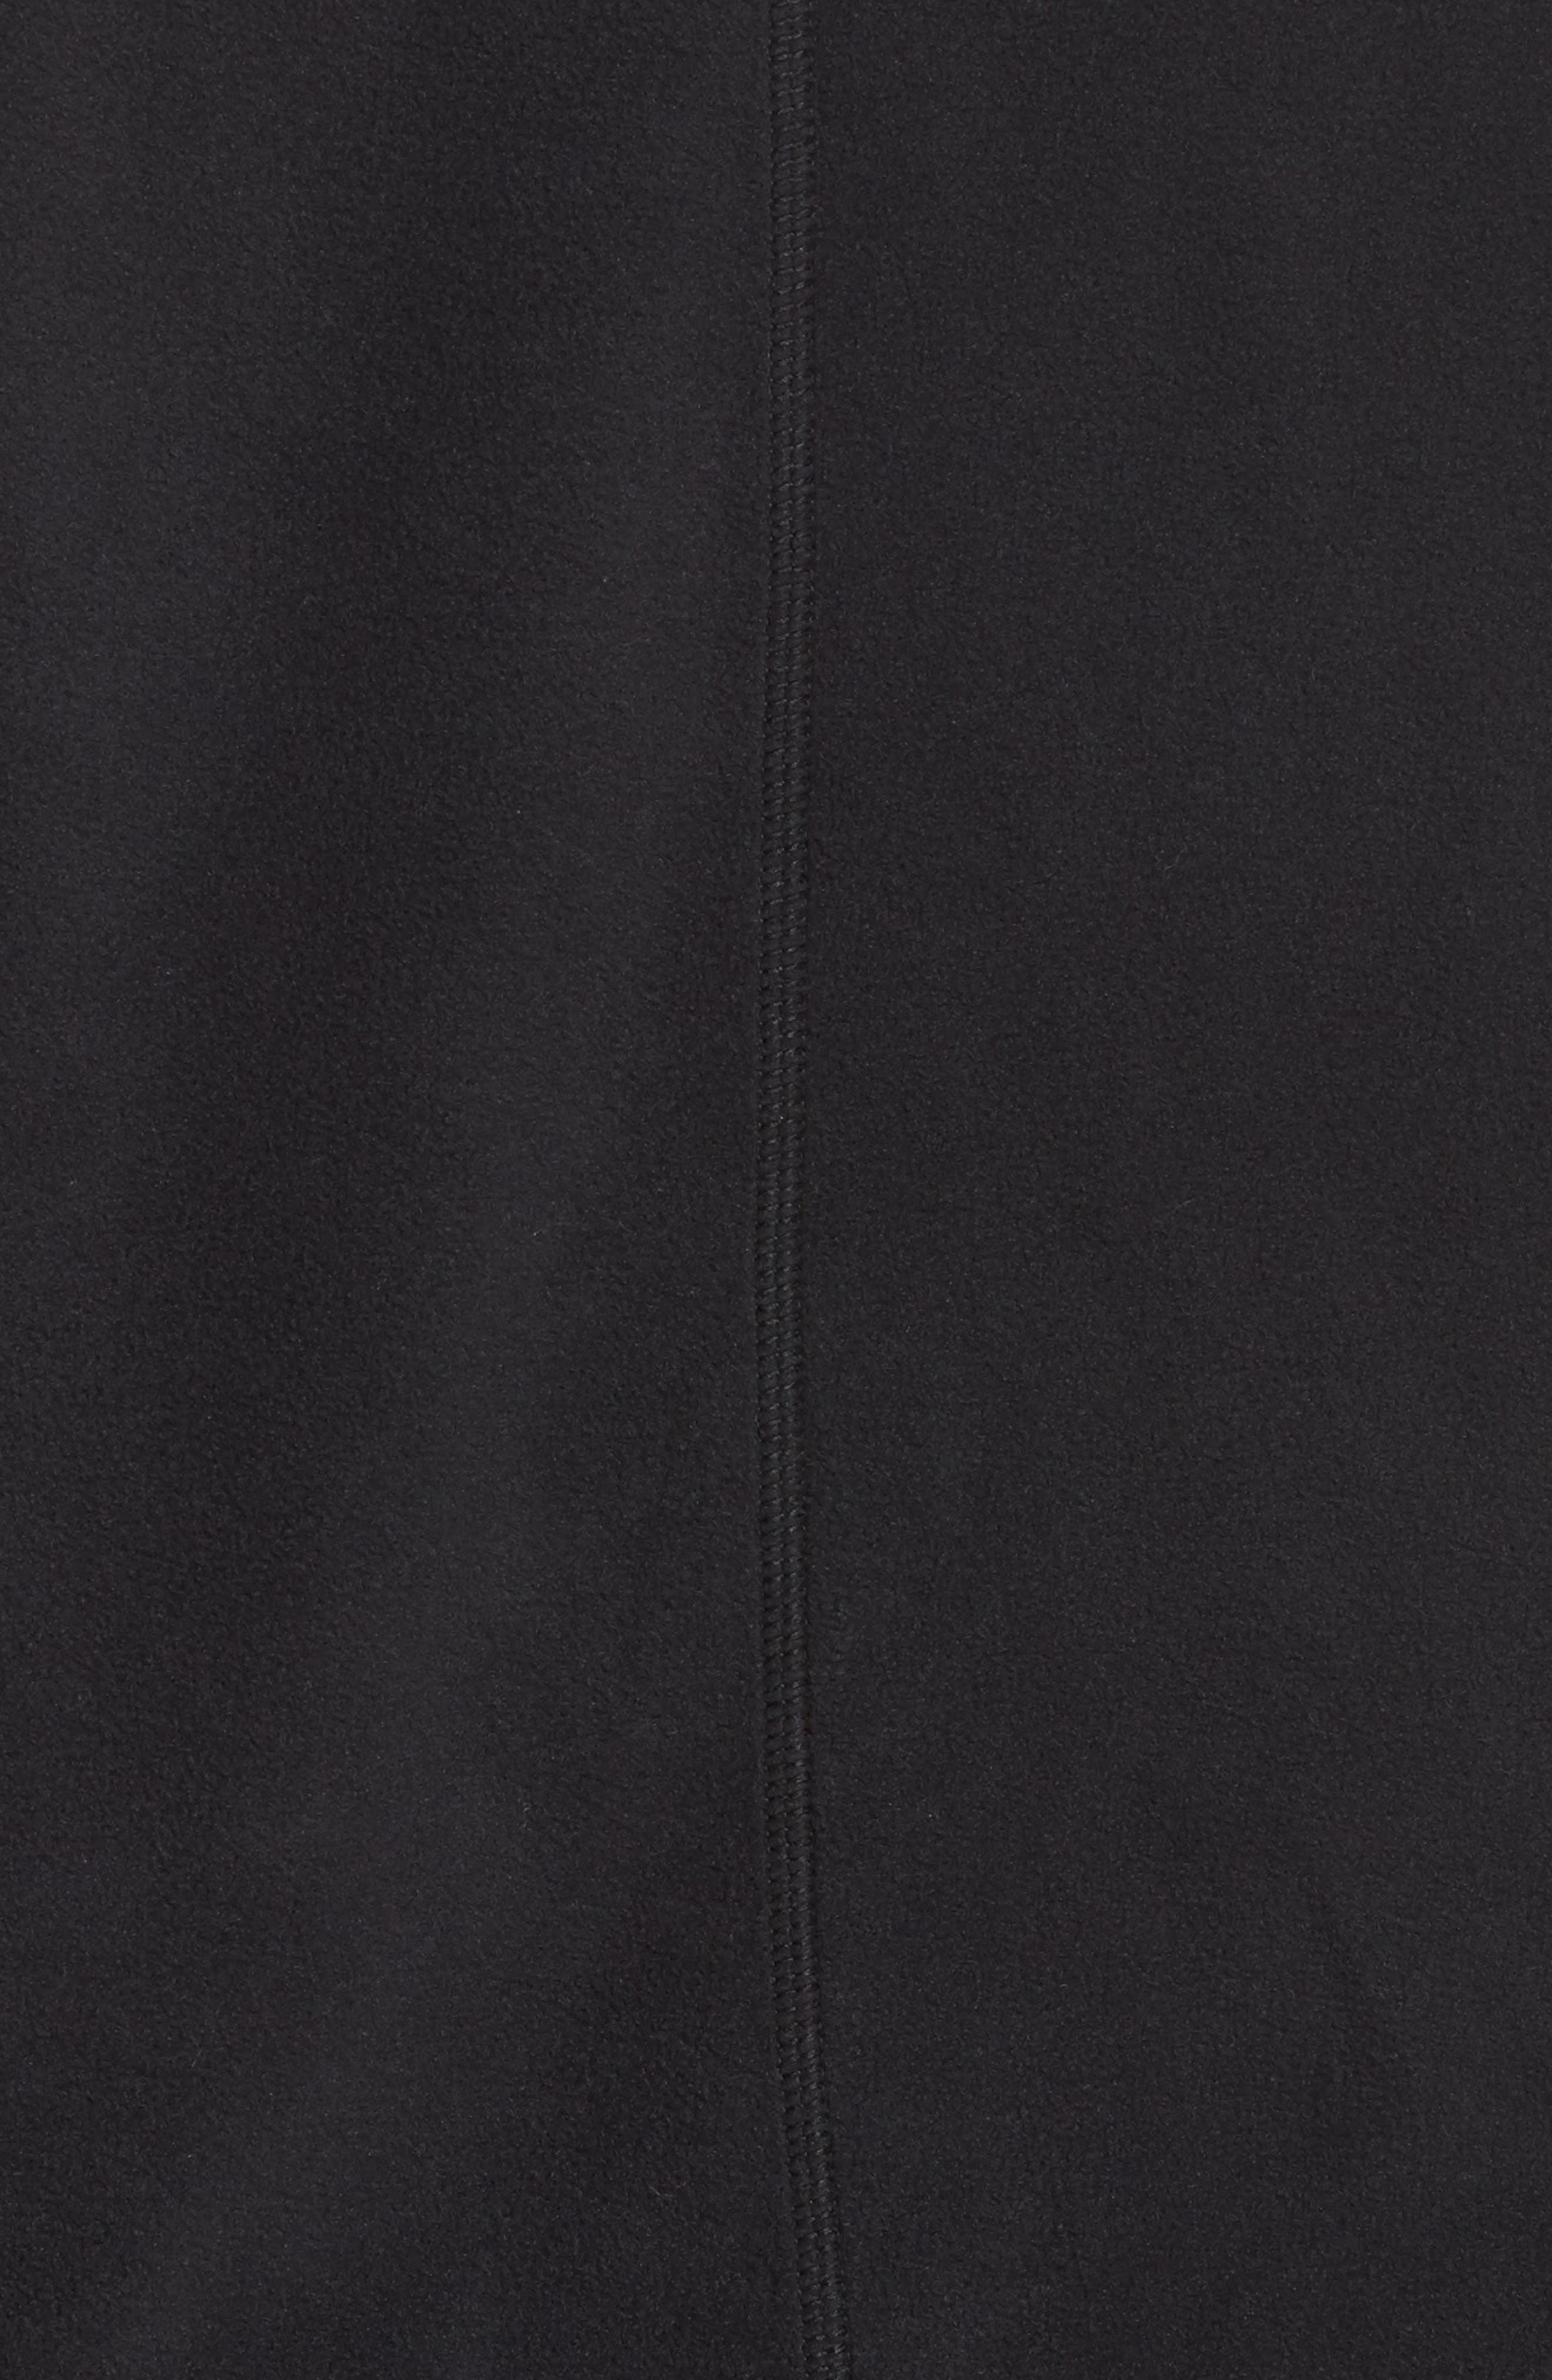 FP Movement Higher Ground Fleece Jacket,                             Alternate thumbnail 10, color,